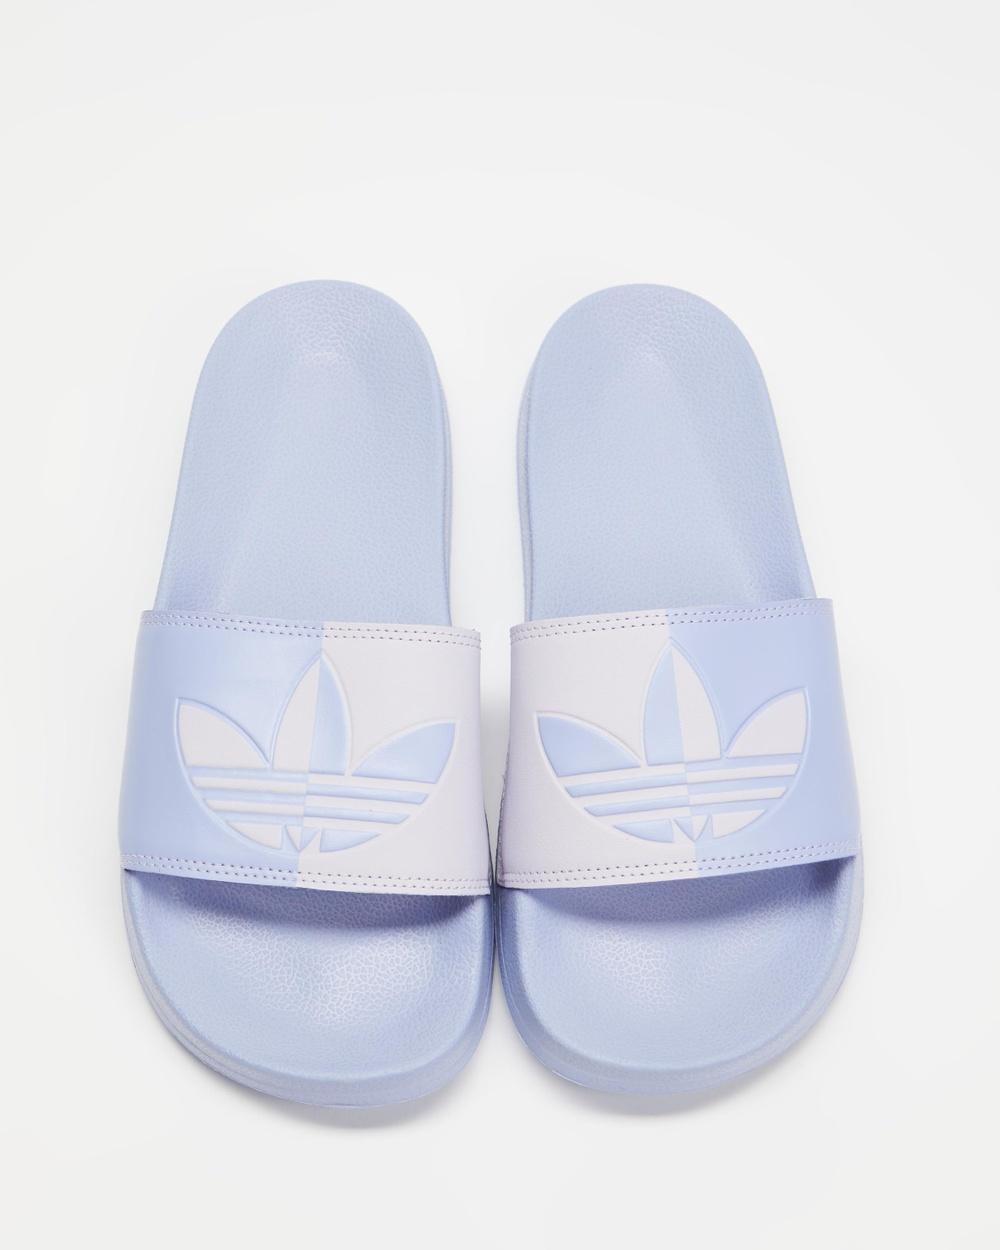 adidas Originals Adilette Lite Women's Sandals Purple & Violet